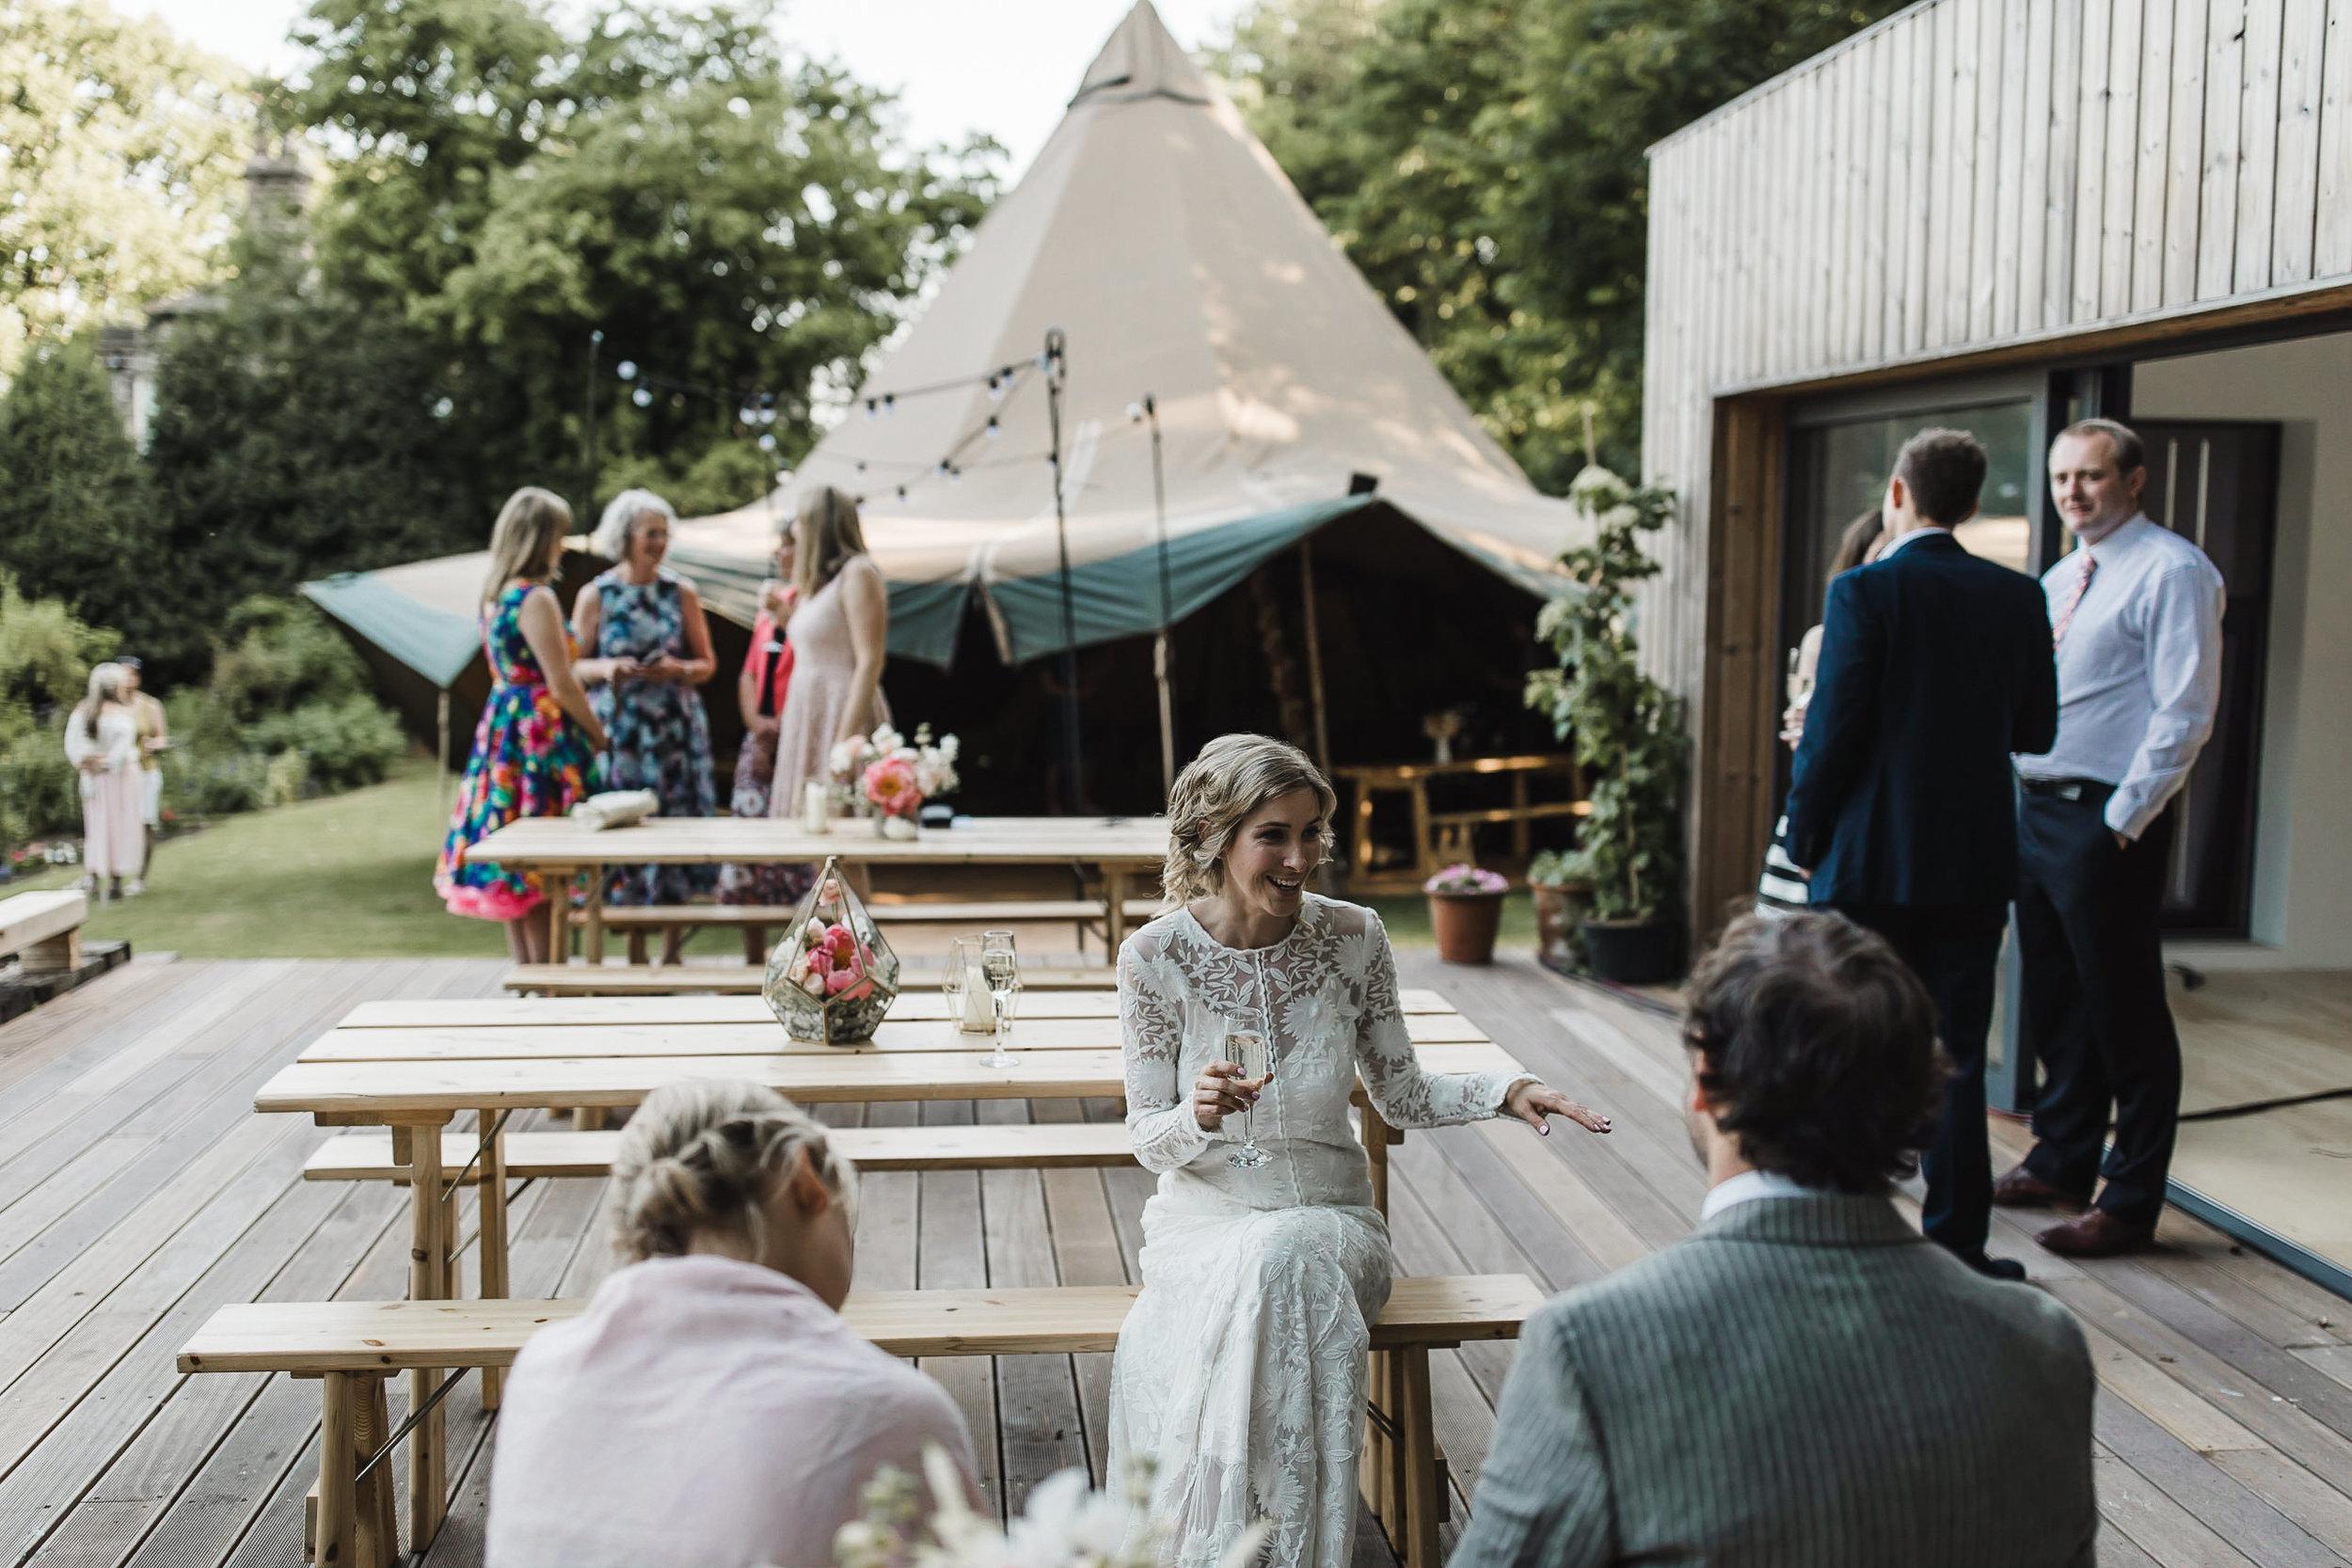 Roundhay-Leeds-Backyard-Wedding-Becs-Chris-206.jpg